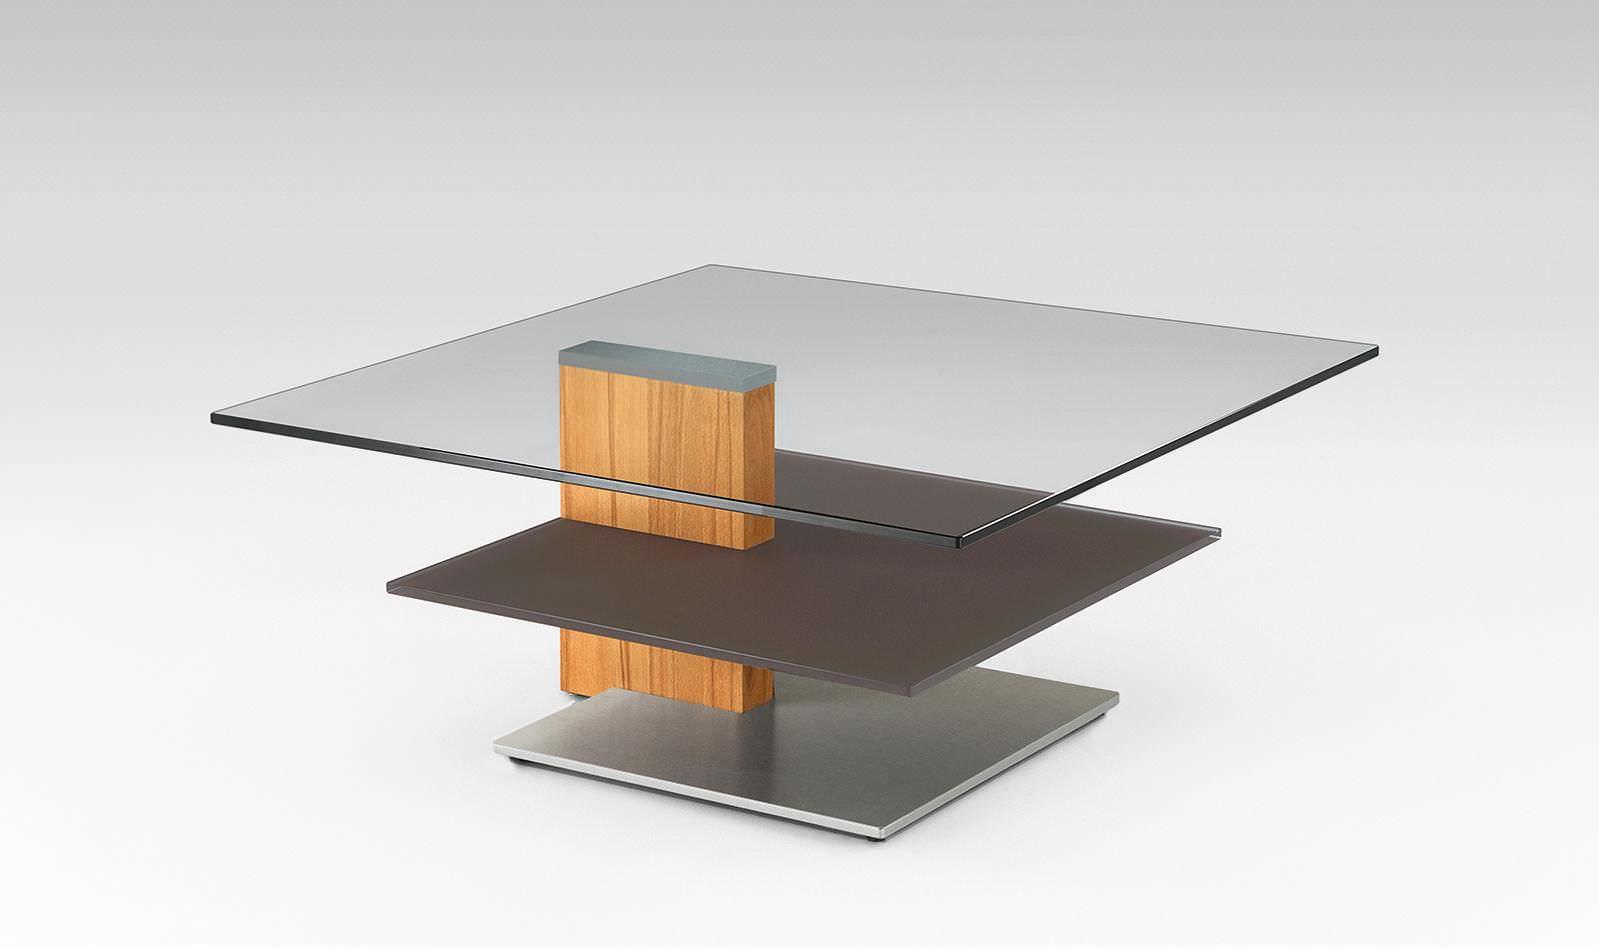 Moderner Couchtisch Holz Glas Quadratisch 4183 Alfons